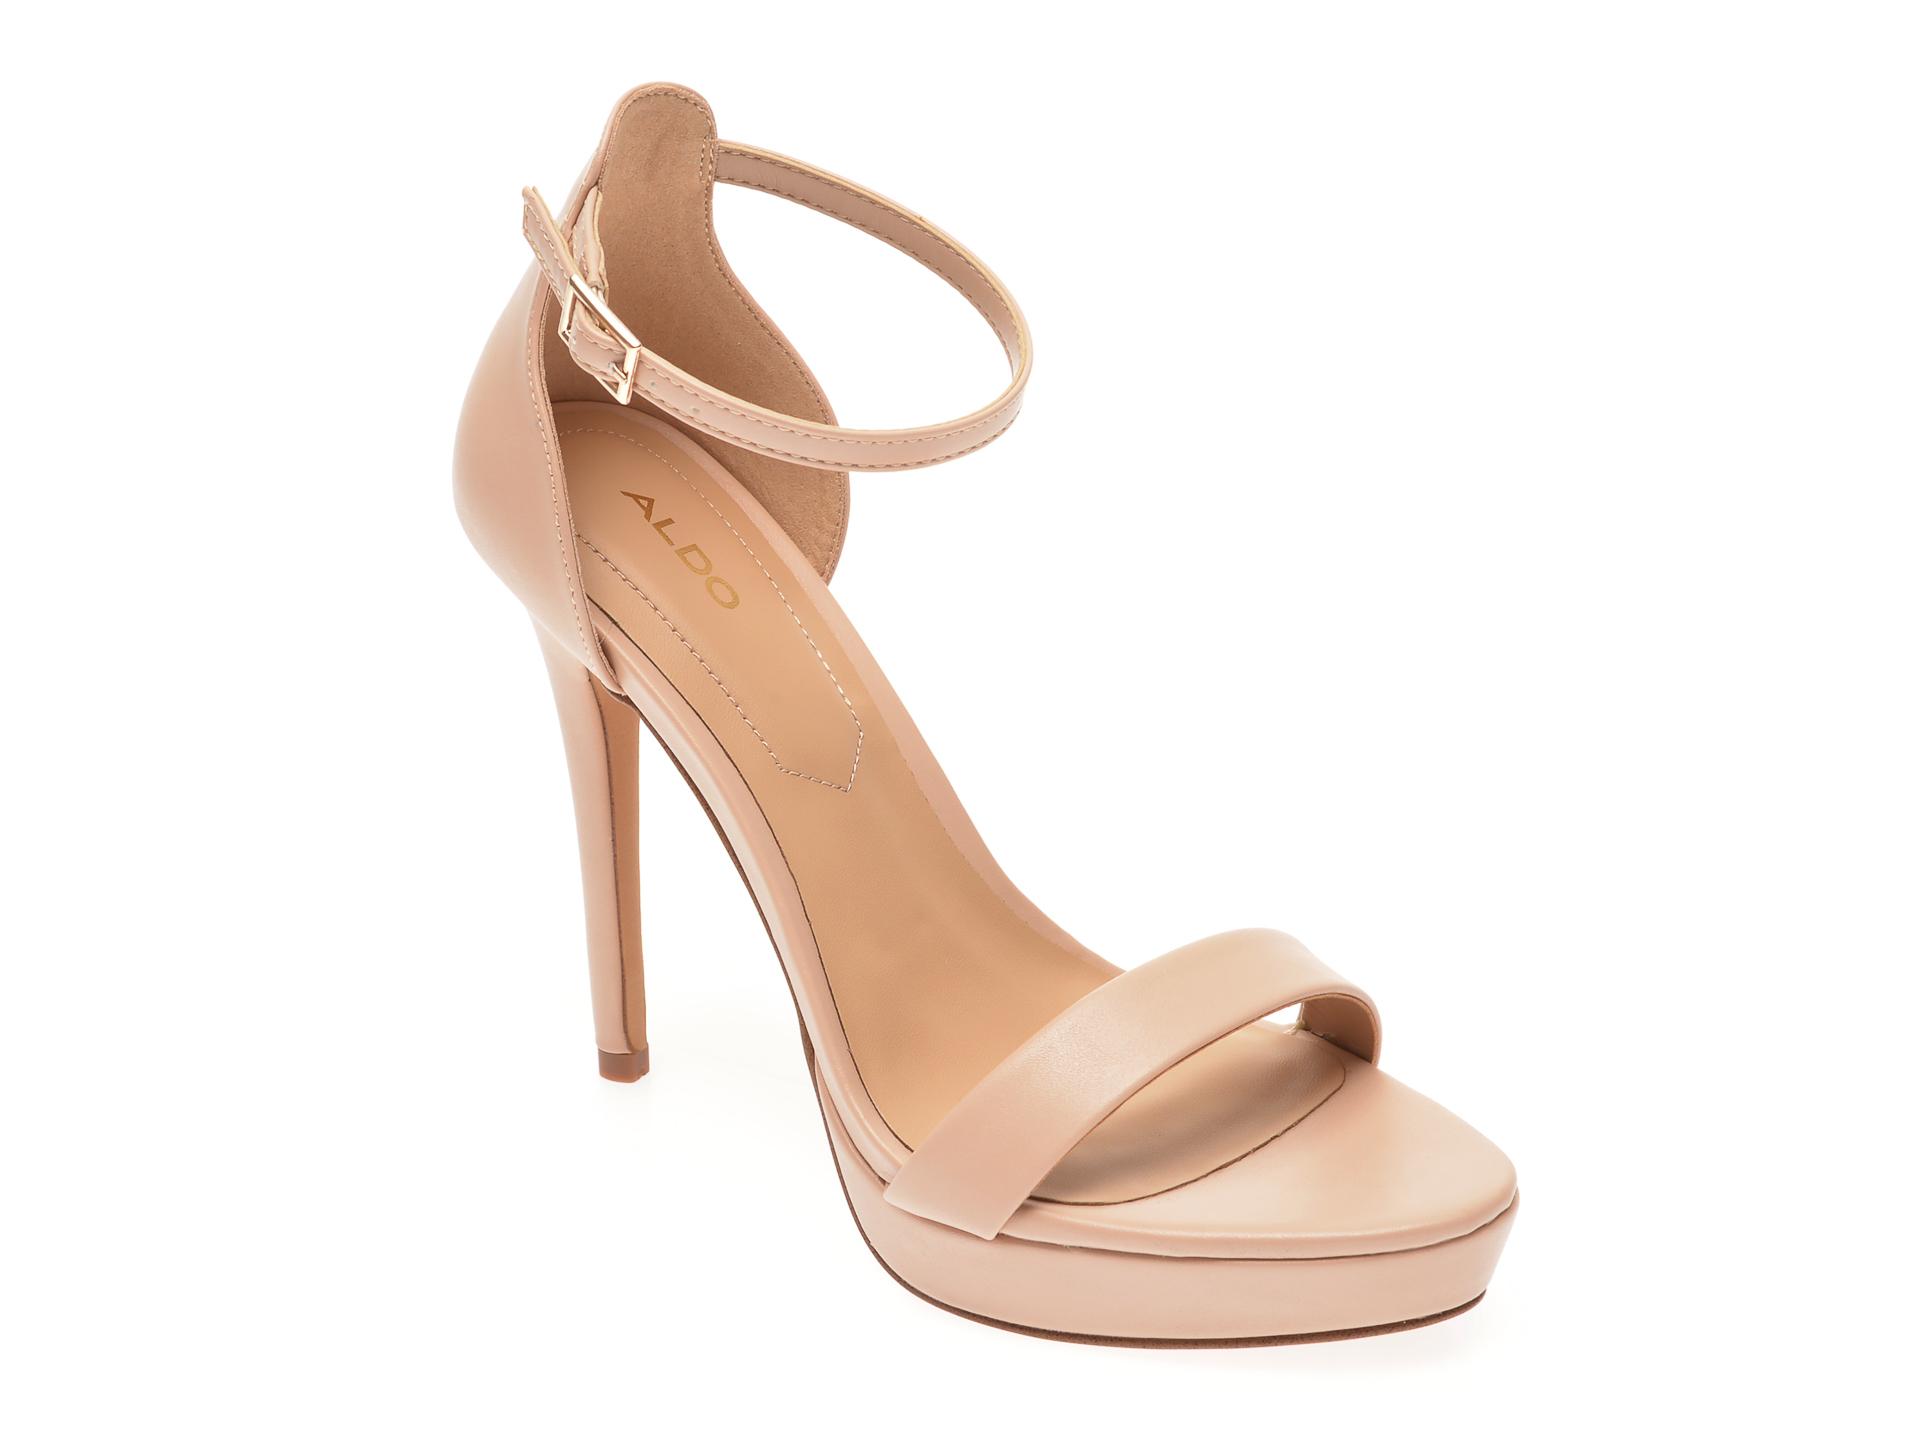 Sandale ALDO bej, Madalene271, din piele ecologica